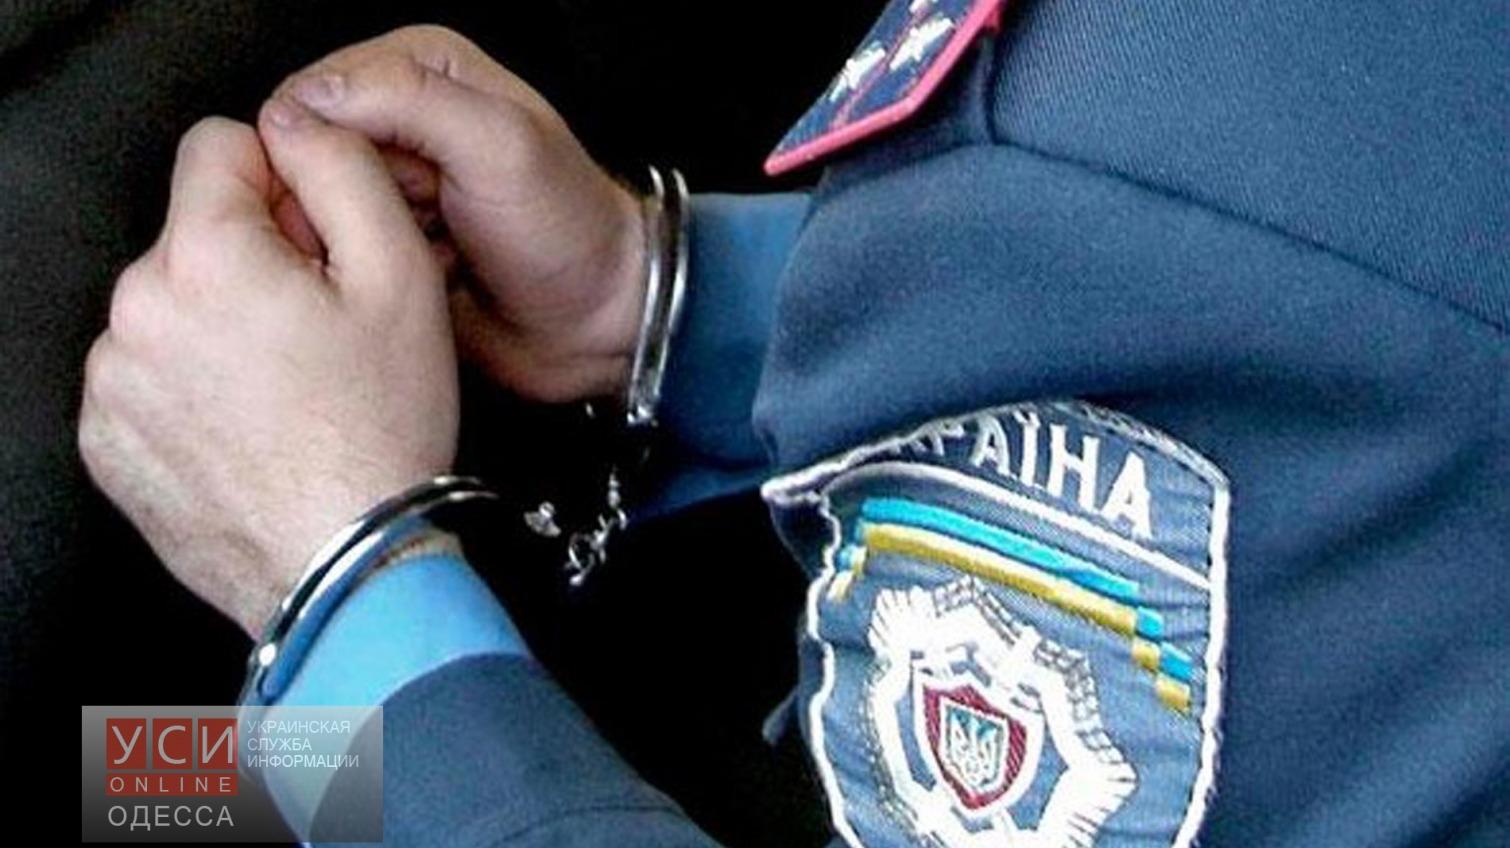 Взяточники из милиции предстанут перед судом «фото»